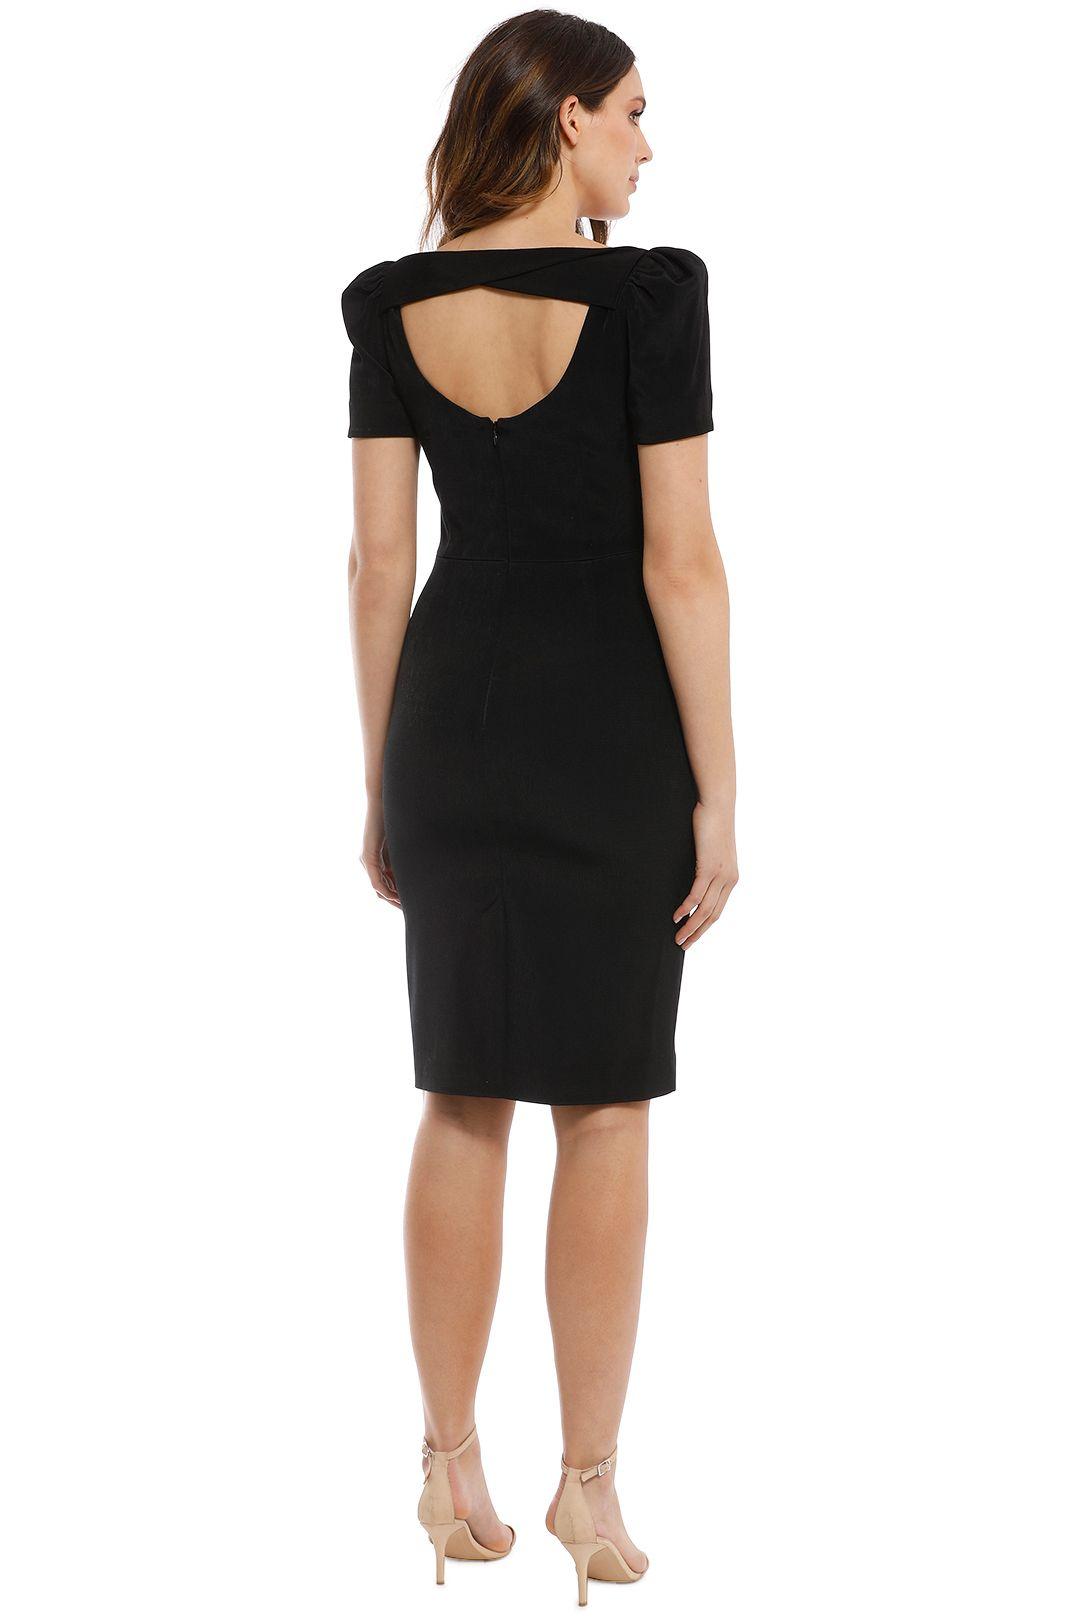 Rebecca Vallance - Ivy Dress - Black - Back